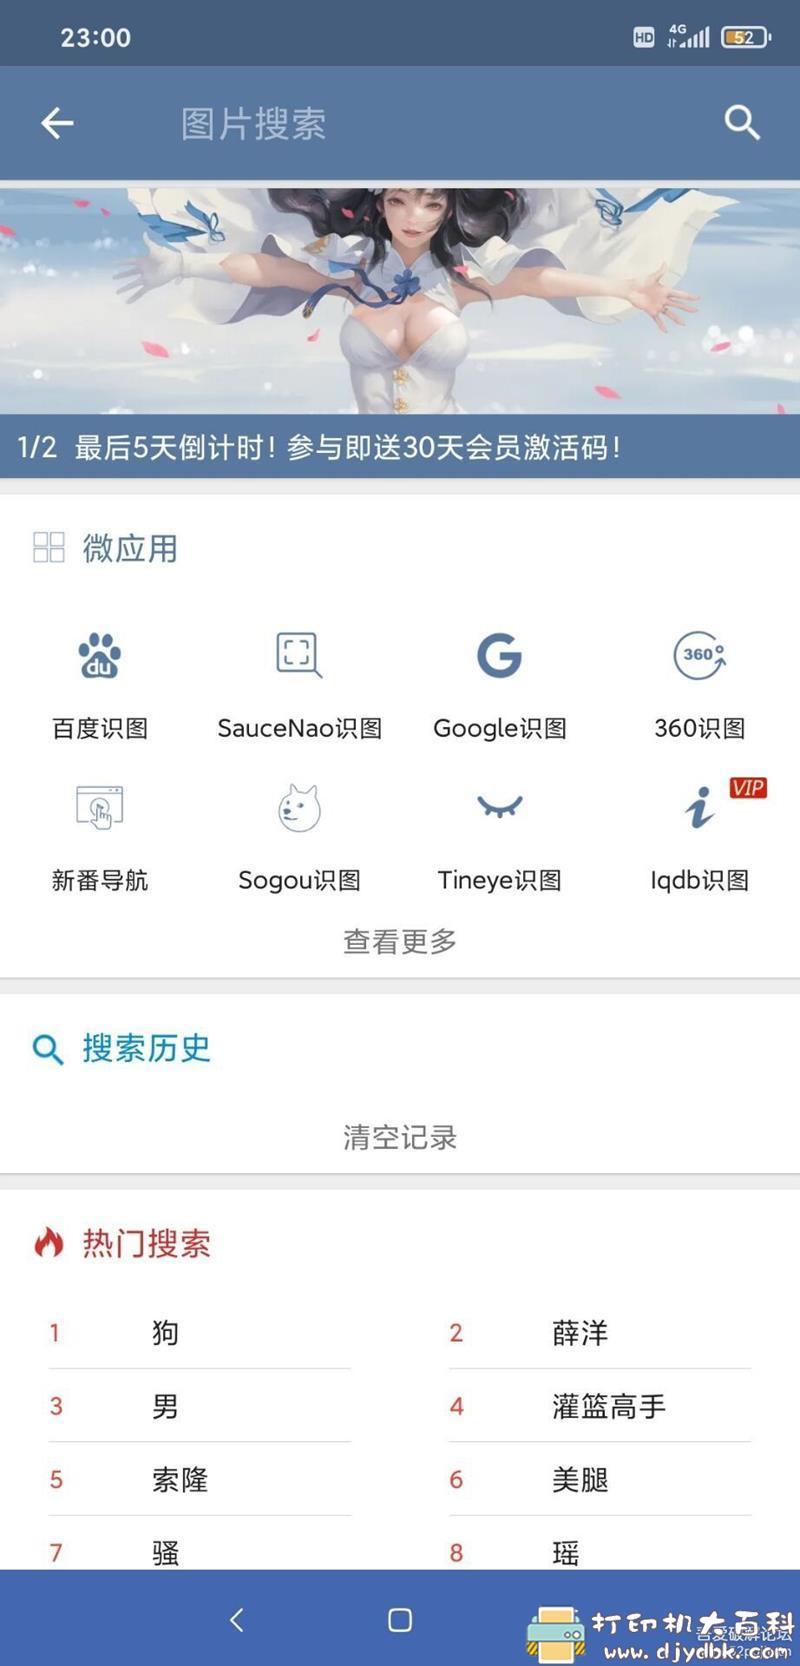 [Android]搜图神器最新版4.3.0元老捐赠会员,超多p站壁纸,二次元必备 配图 No.5